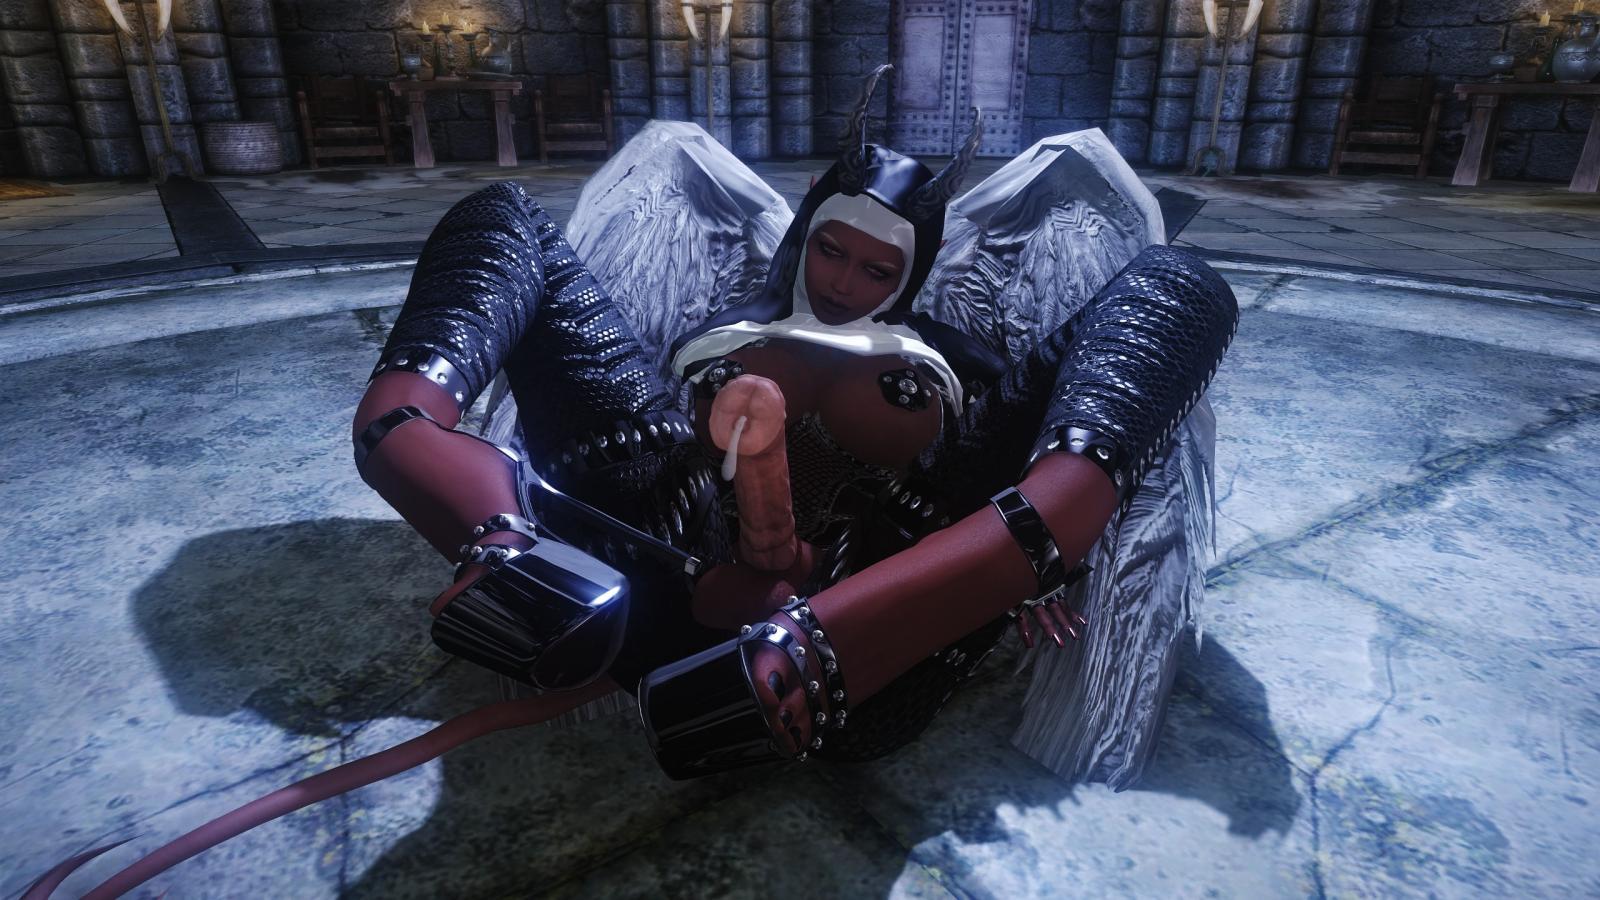 horny Succubusangel-Nun